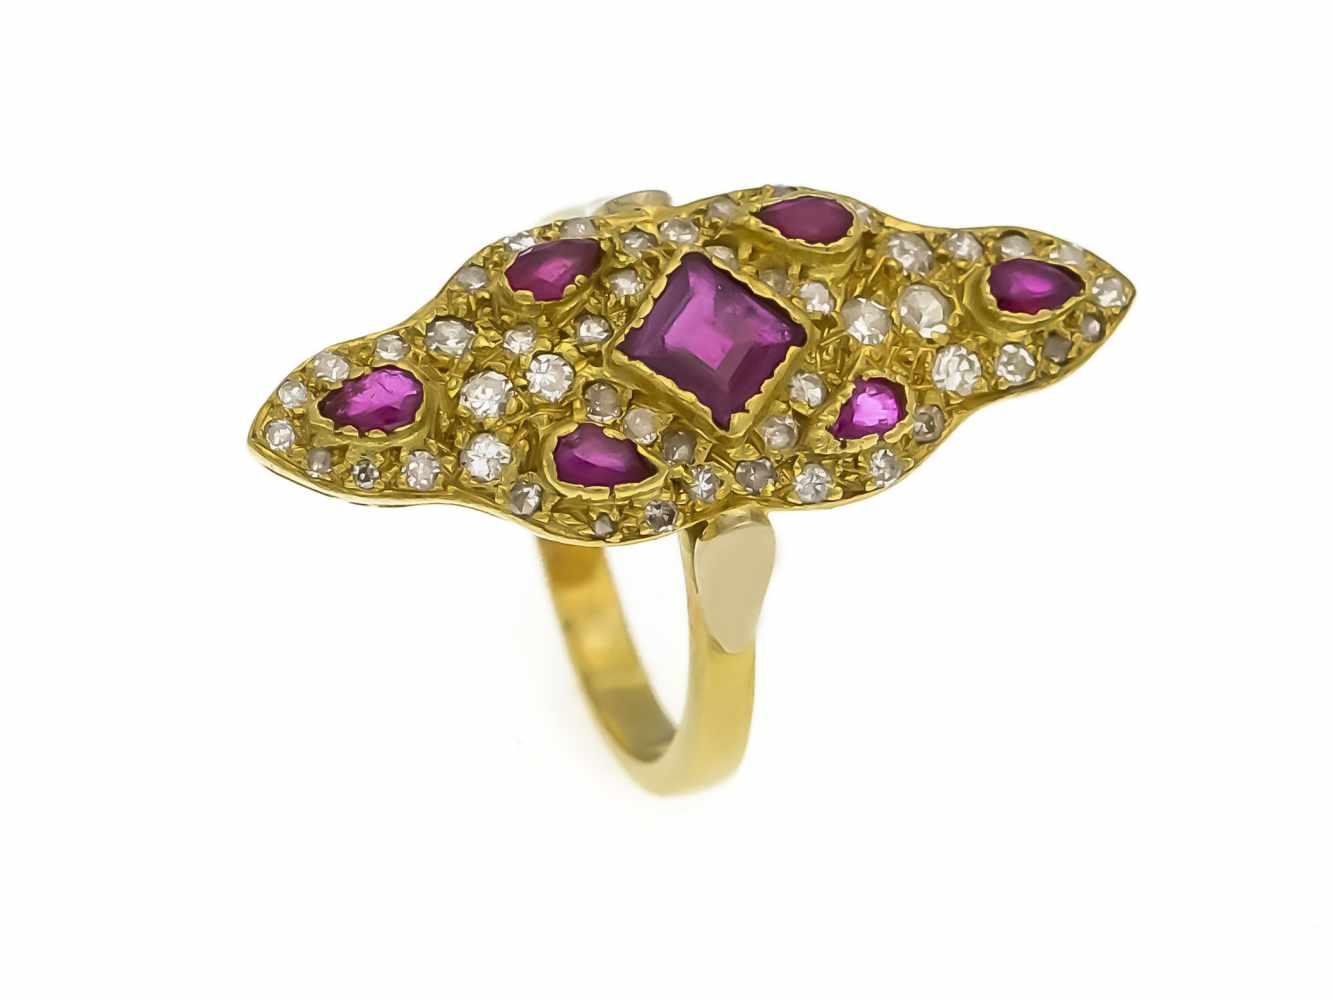 Lot 18 - Rubin-Diamant-Ring GG 750/000 mit einem fac. Rubin-Carré 4,5 mm, 6 fac. Rubin-Tropfen 3 mmin guter